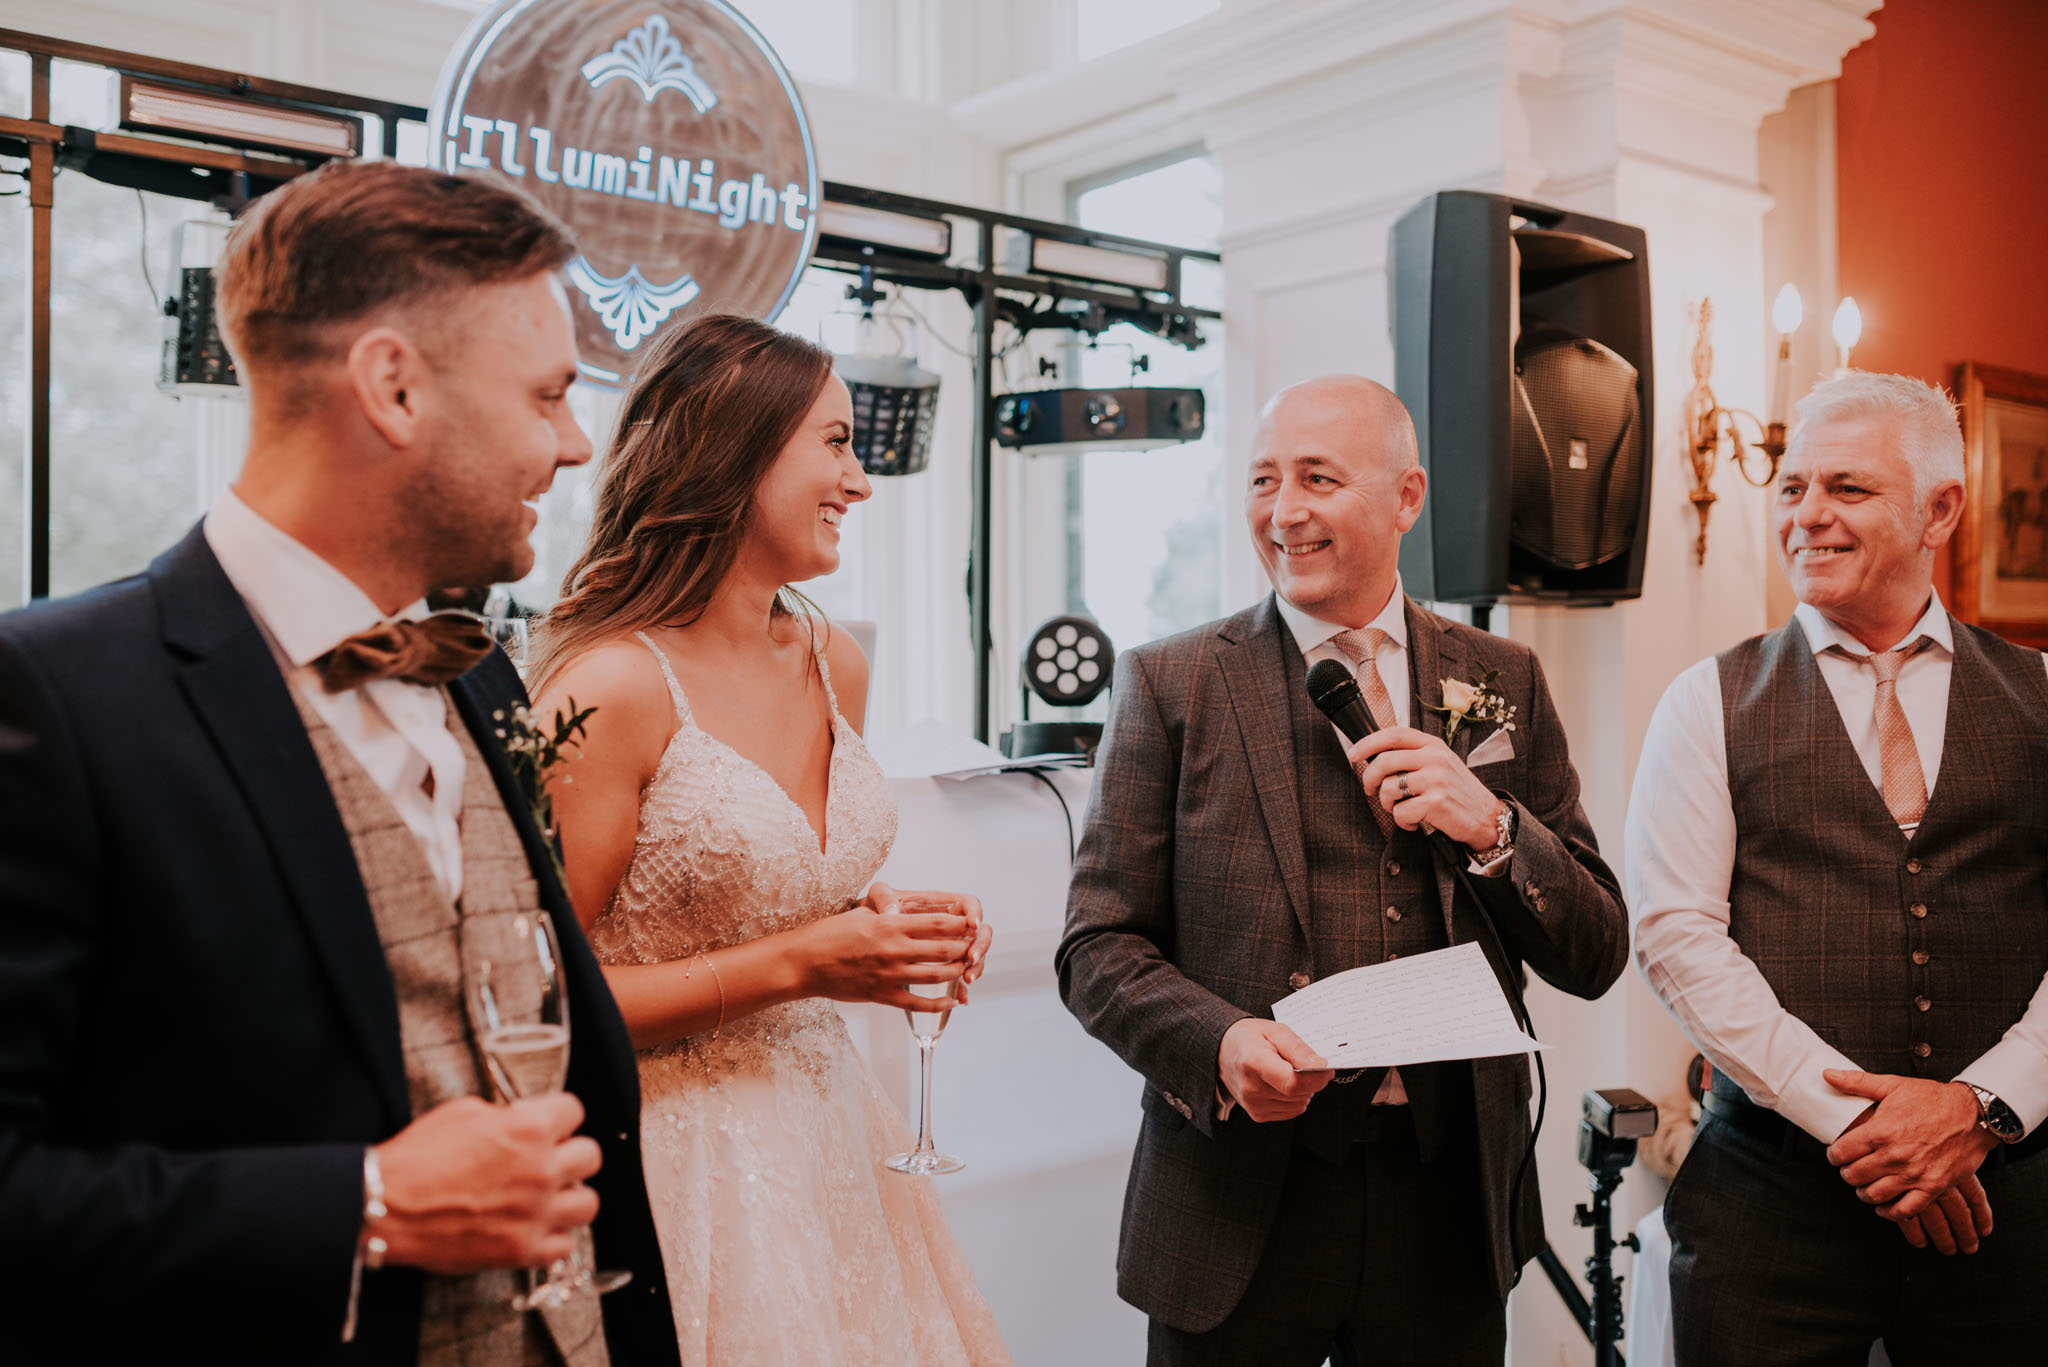 wedding-photographer-glewstone-court-hereford-scott-stockwell-photography408.jpg